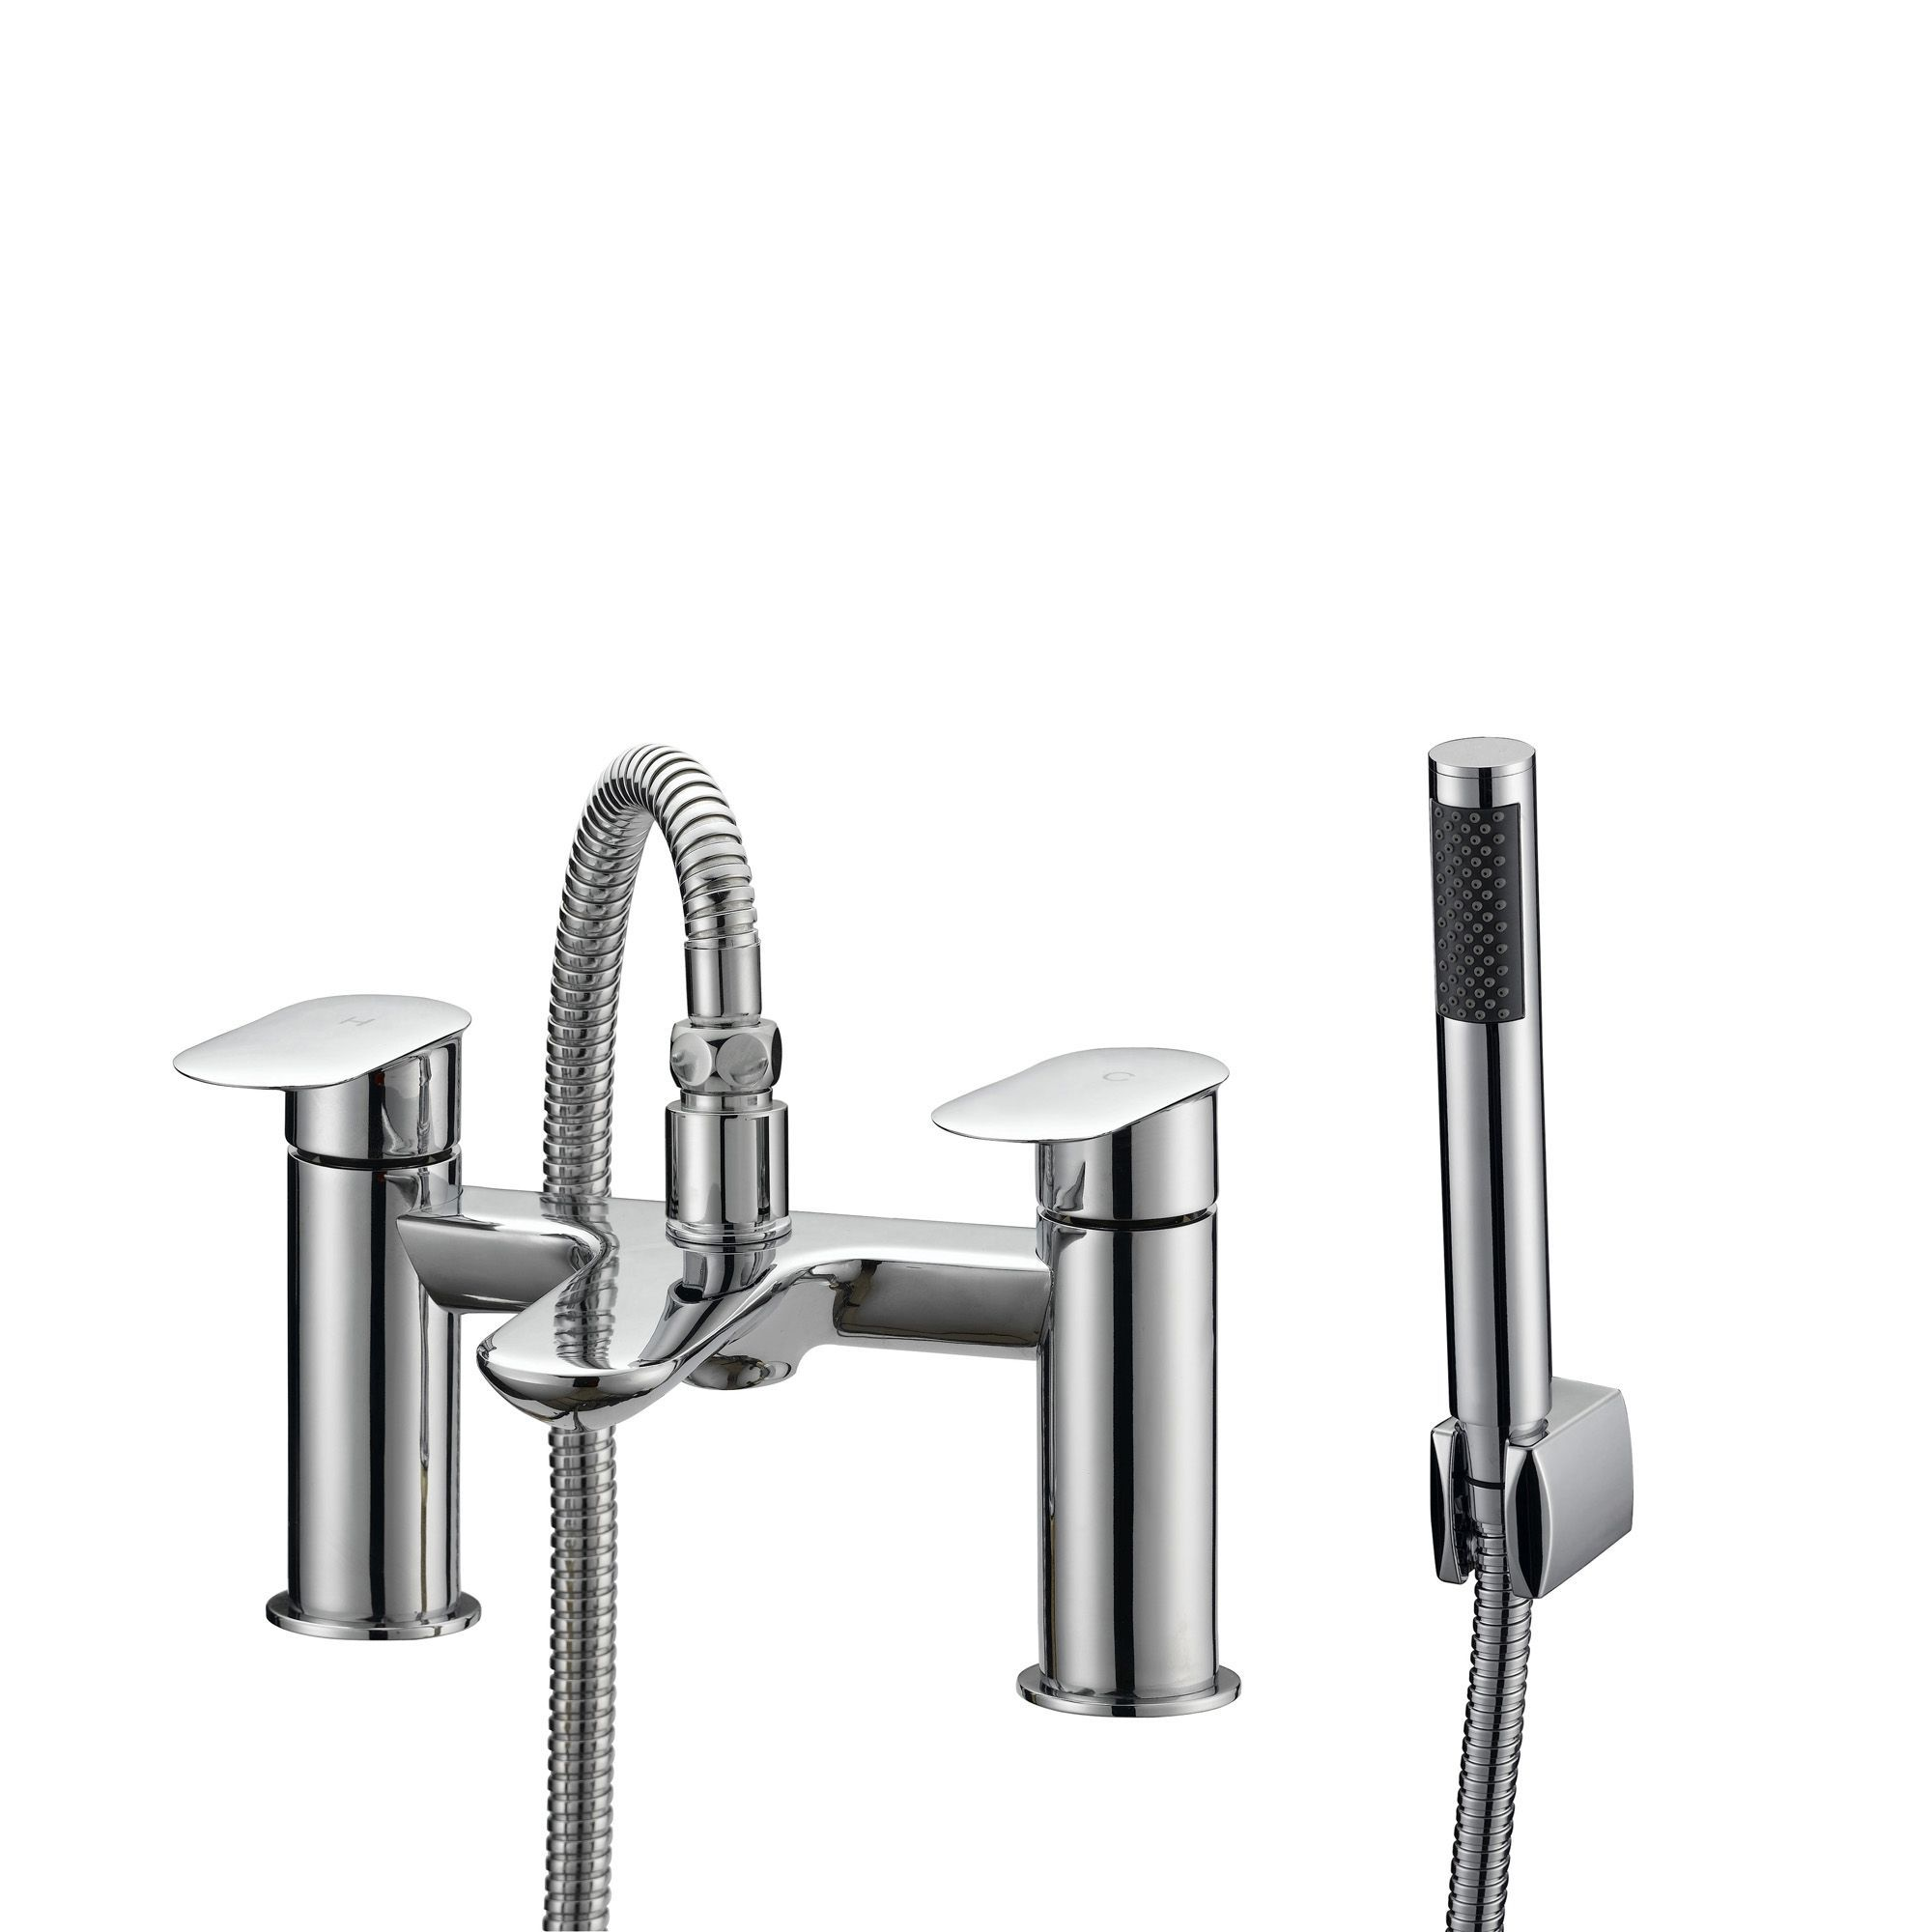 cooke lewis saru chrome bath shower mixer tap. Black Bedroom Furniture Sets. Home Design Ideas